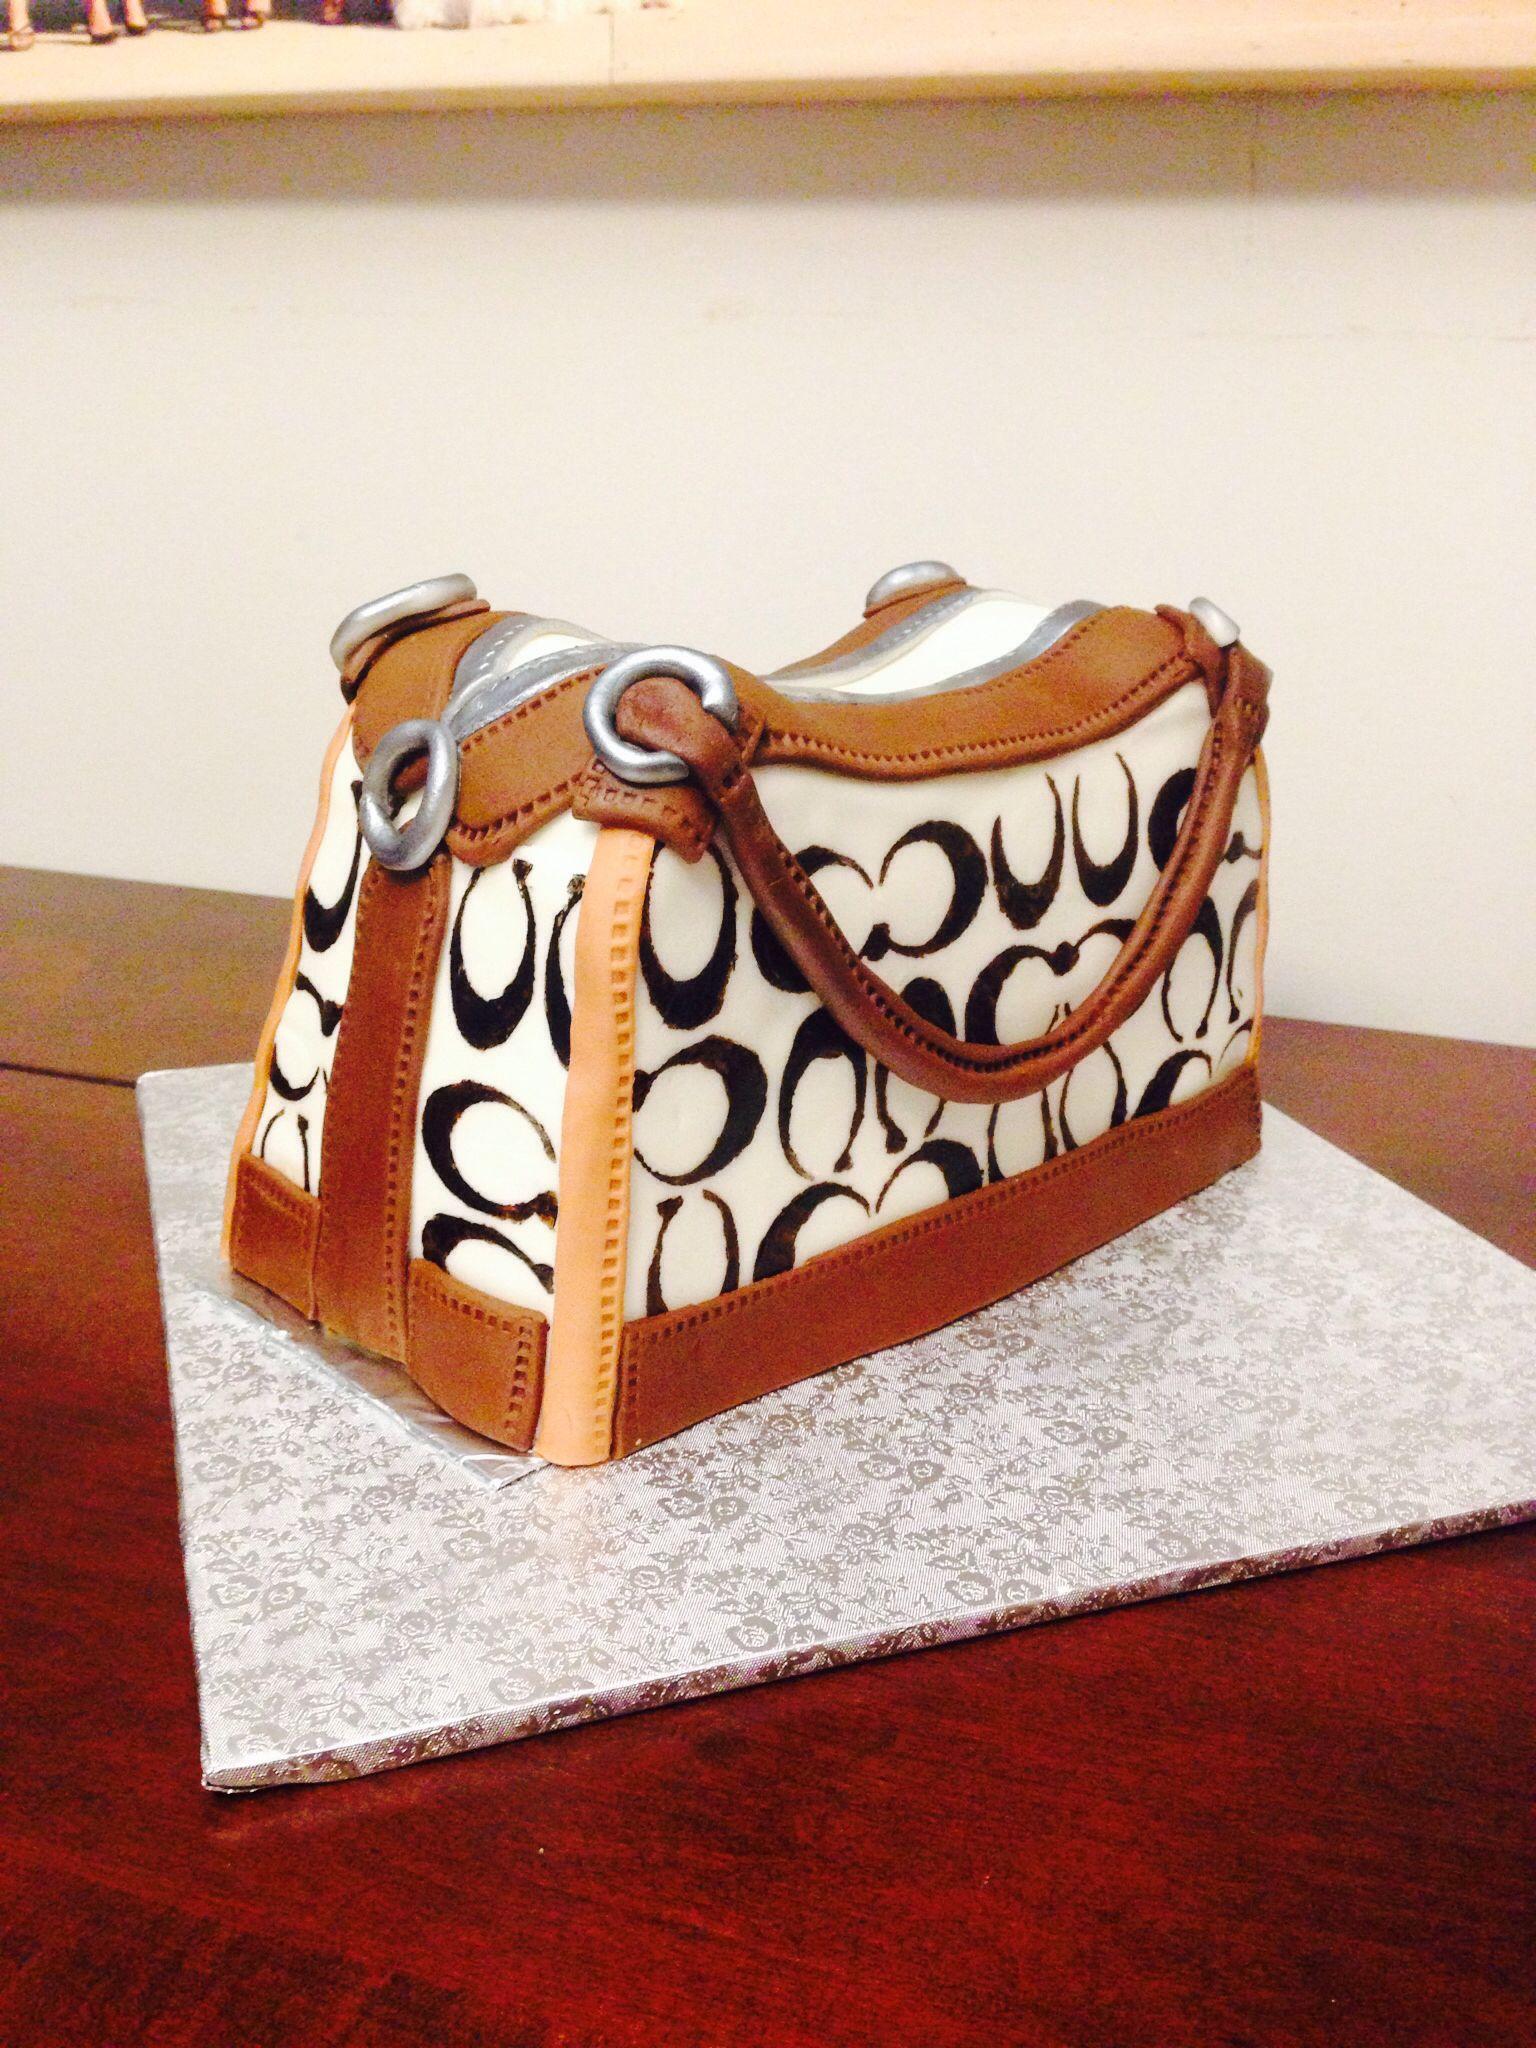 Coach purse cake. Gluten free chocolate fudge cake with vanilla buttercream and marshmallow fondant accents.